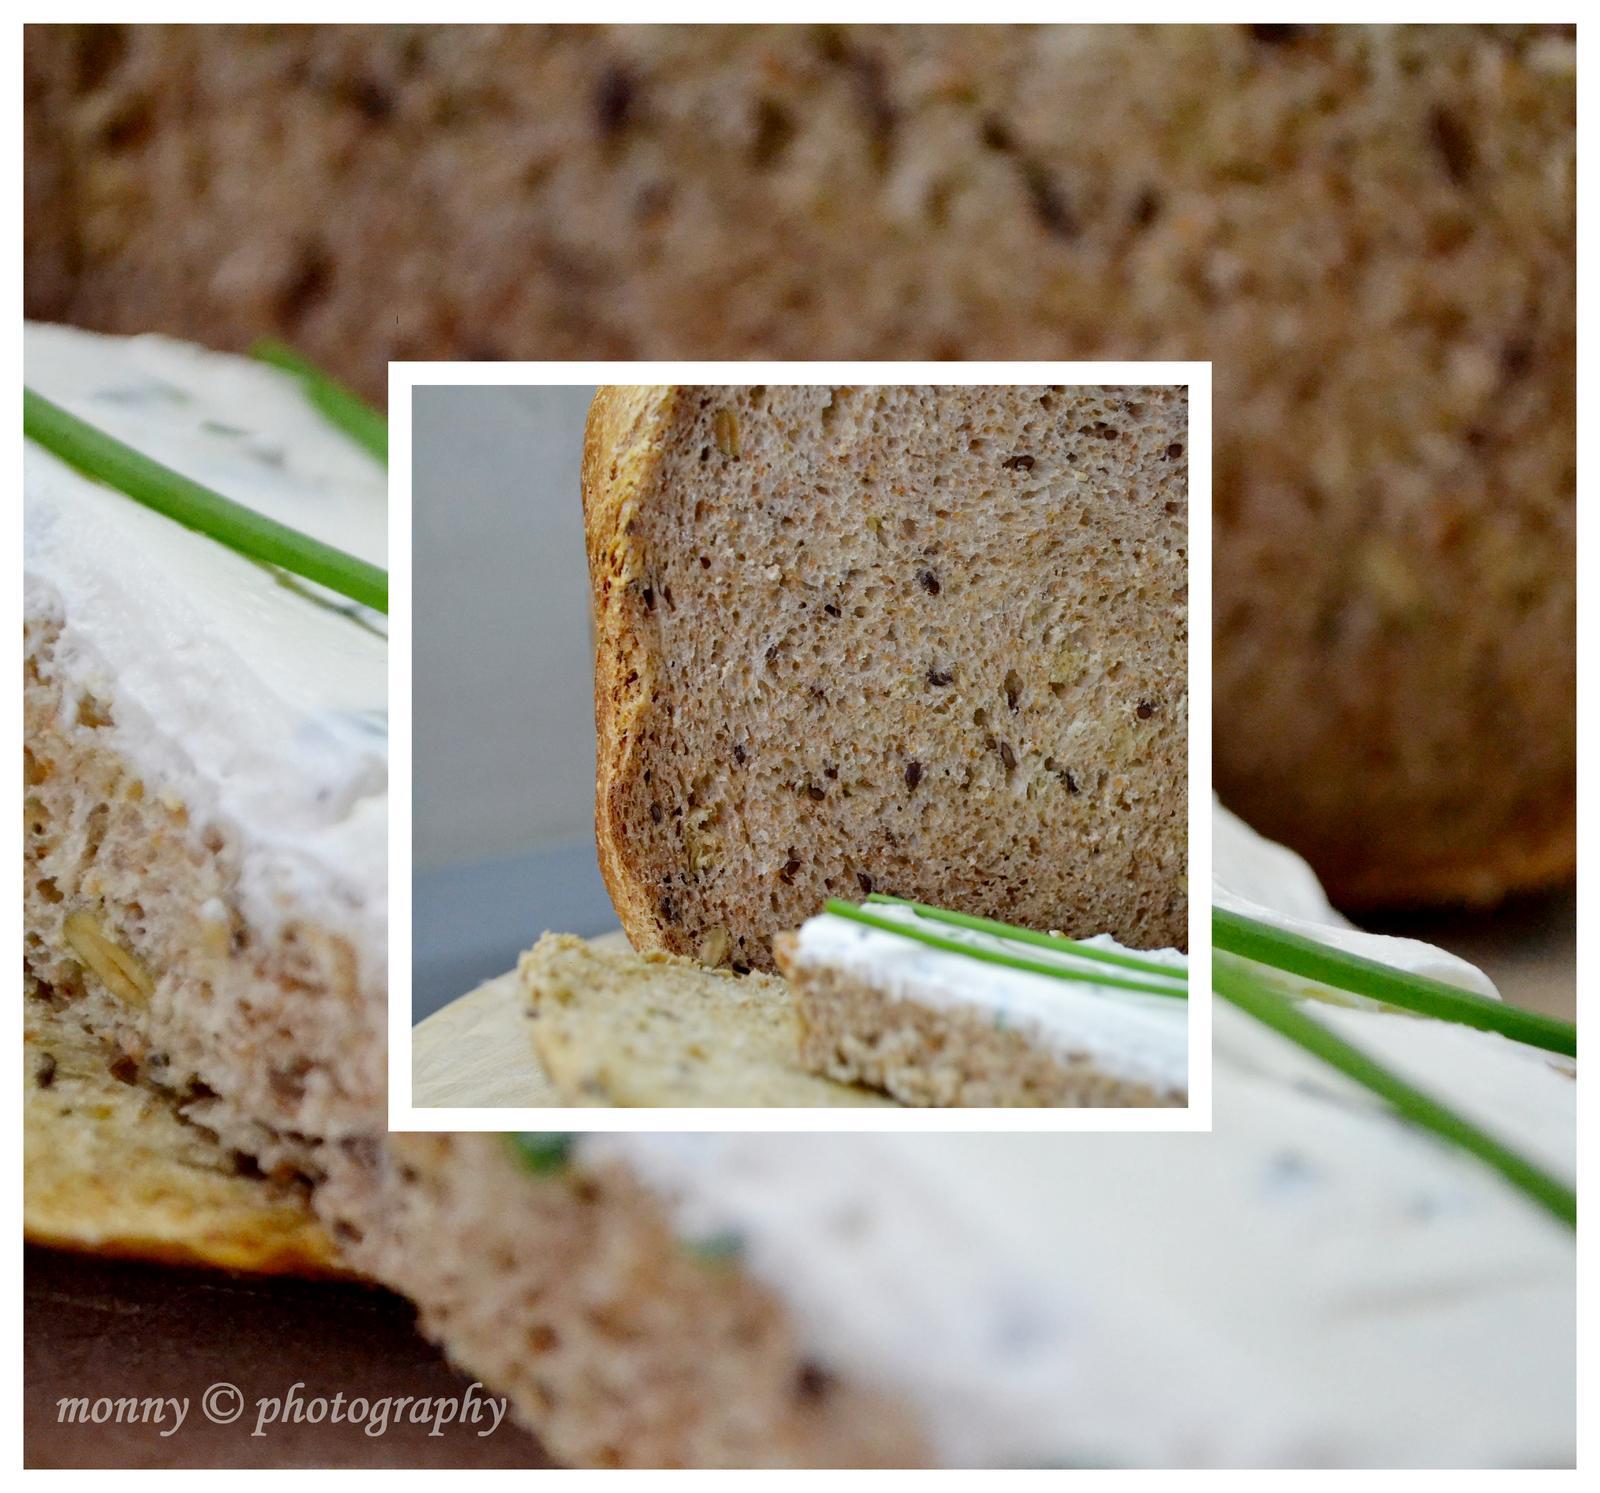 Upečeno a uvařeno u nás doma - Celozrnný chléb s cibulí a tymiánem, namazaný domácí lučinou s pažitkou